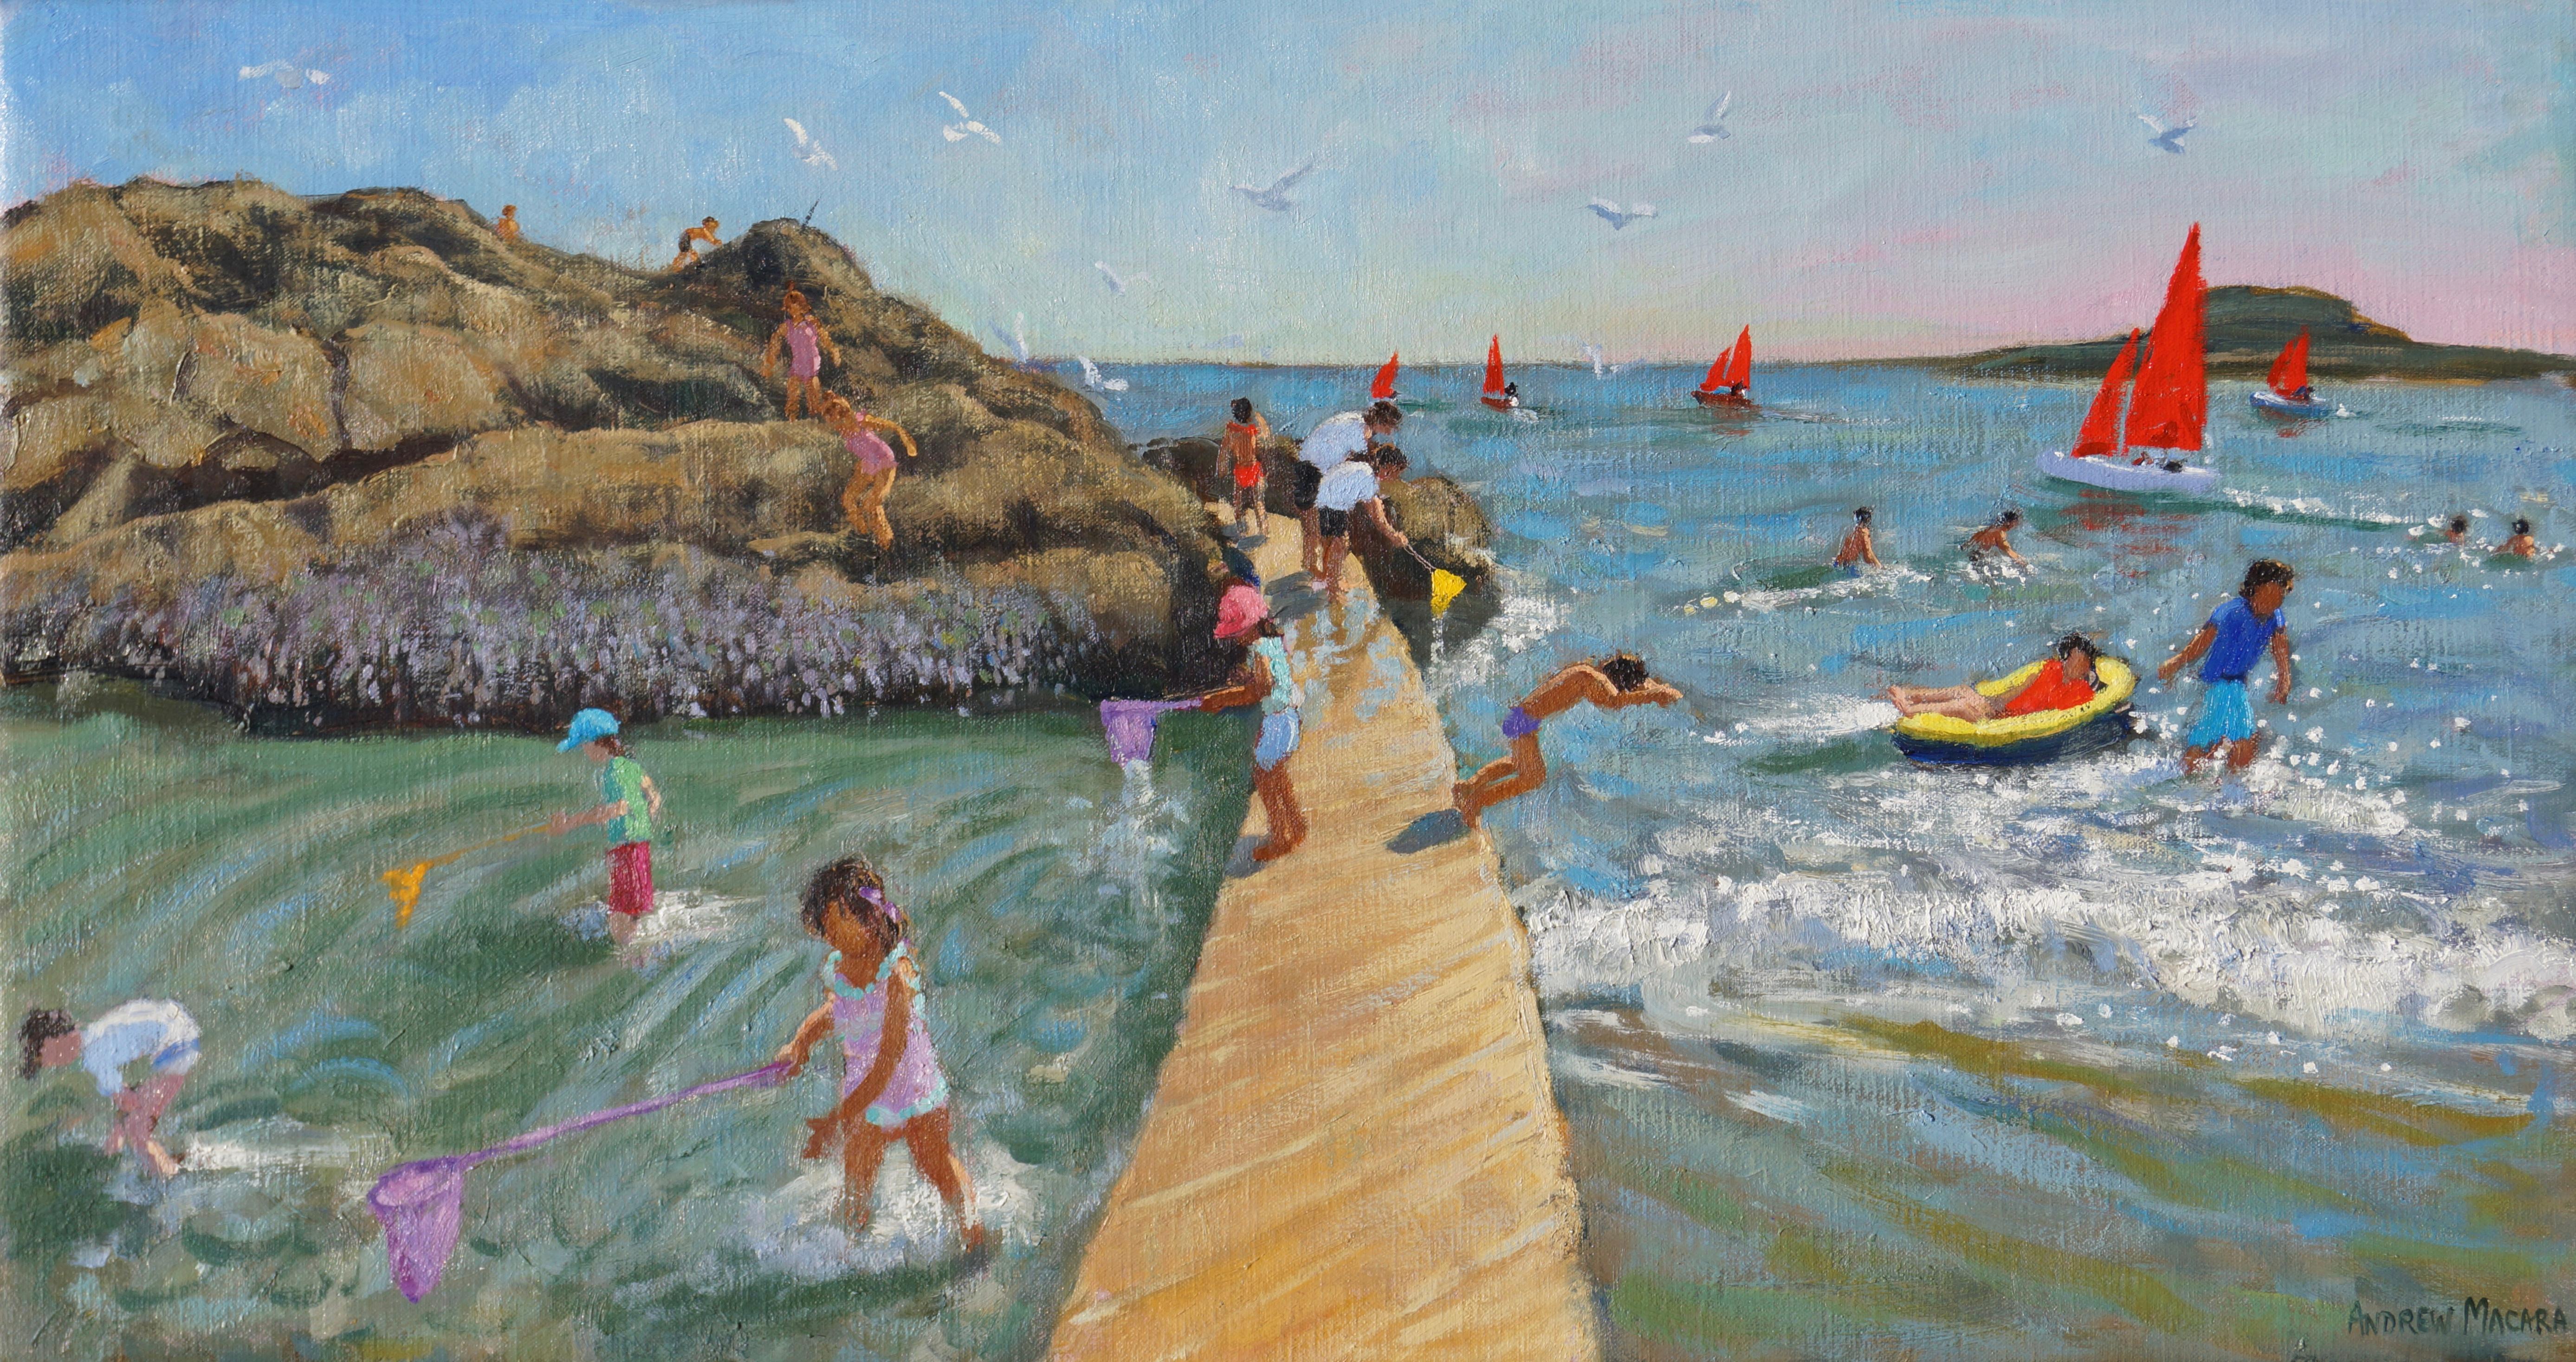 Fishing, swimming, sailing, Looe